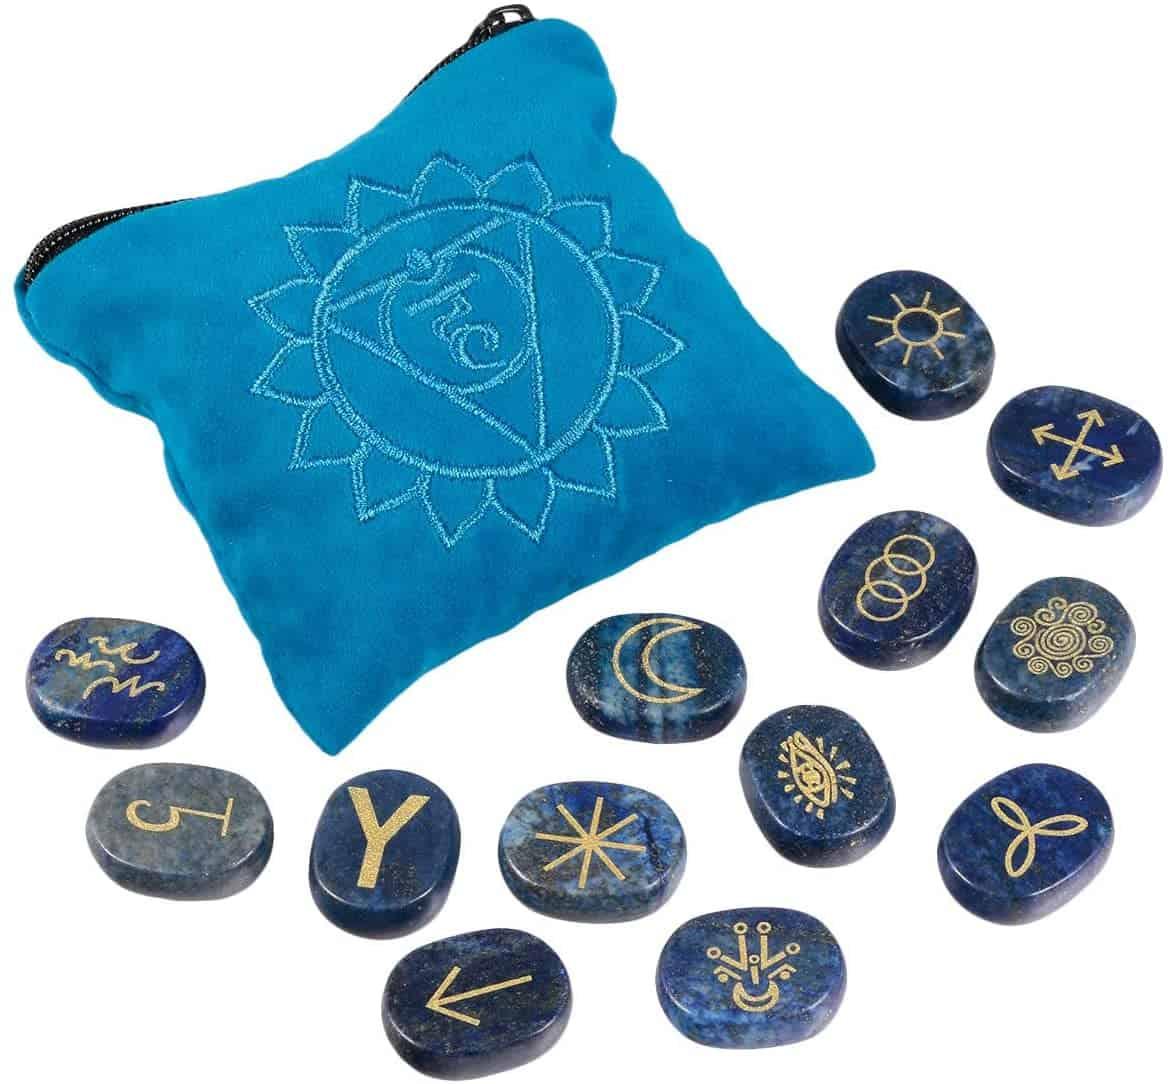 chakra bag - positive mindset - Meditation Hypnosis